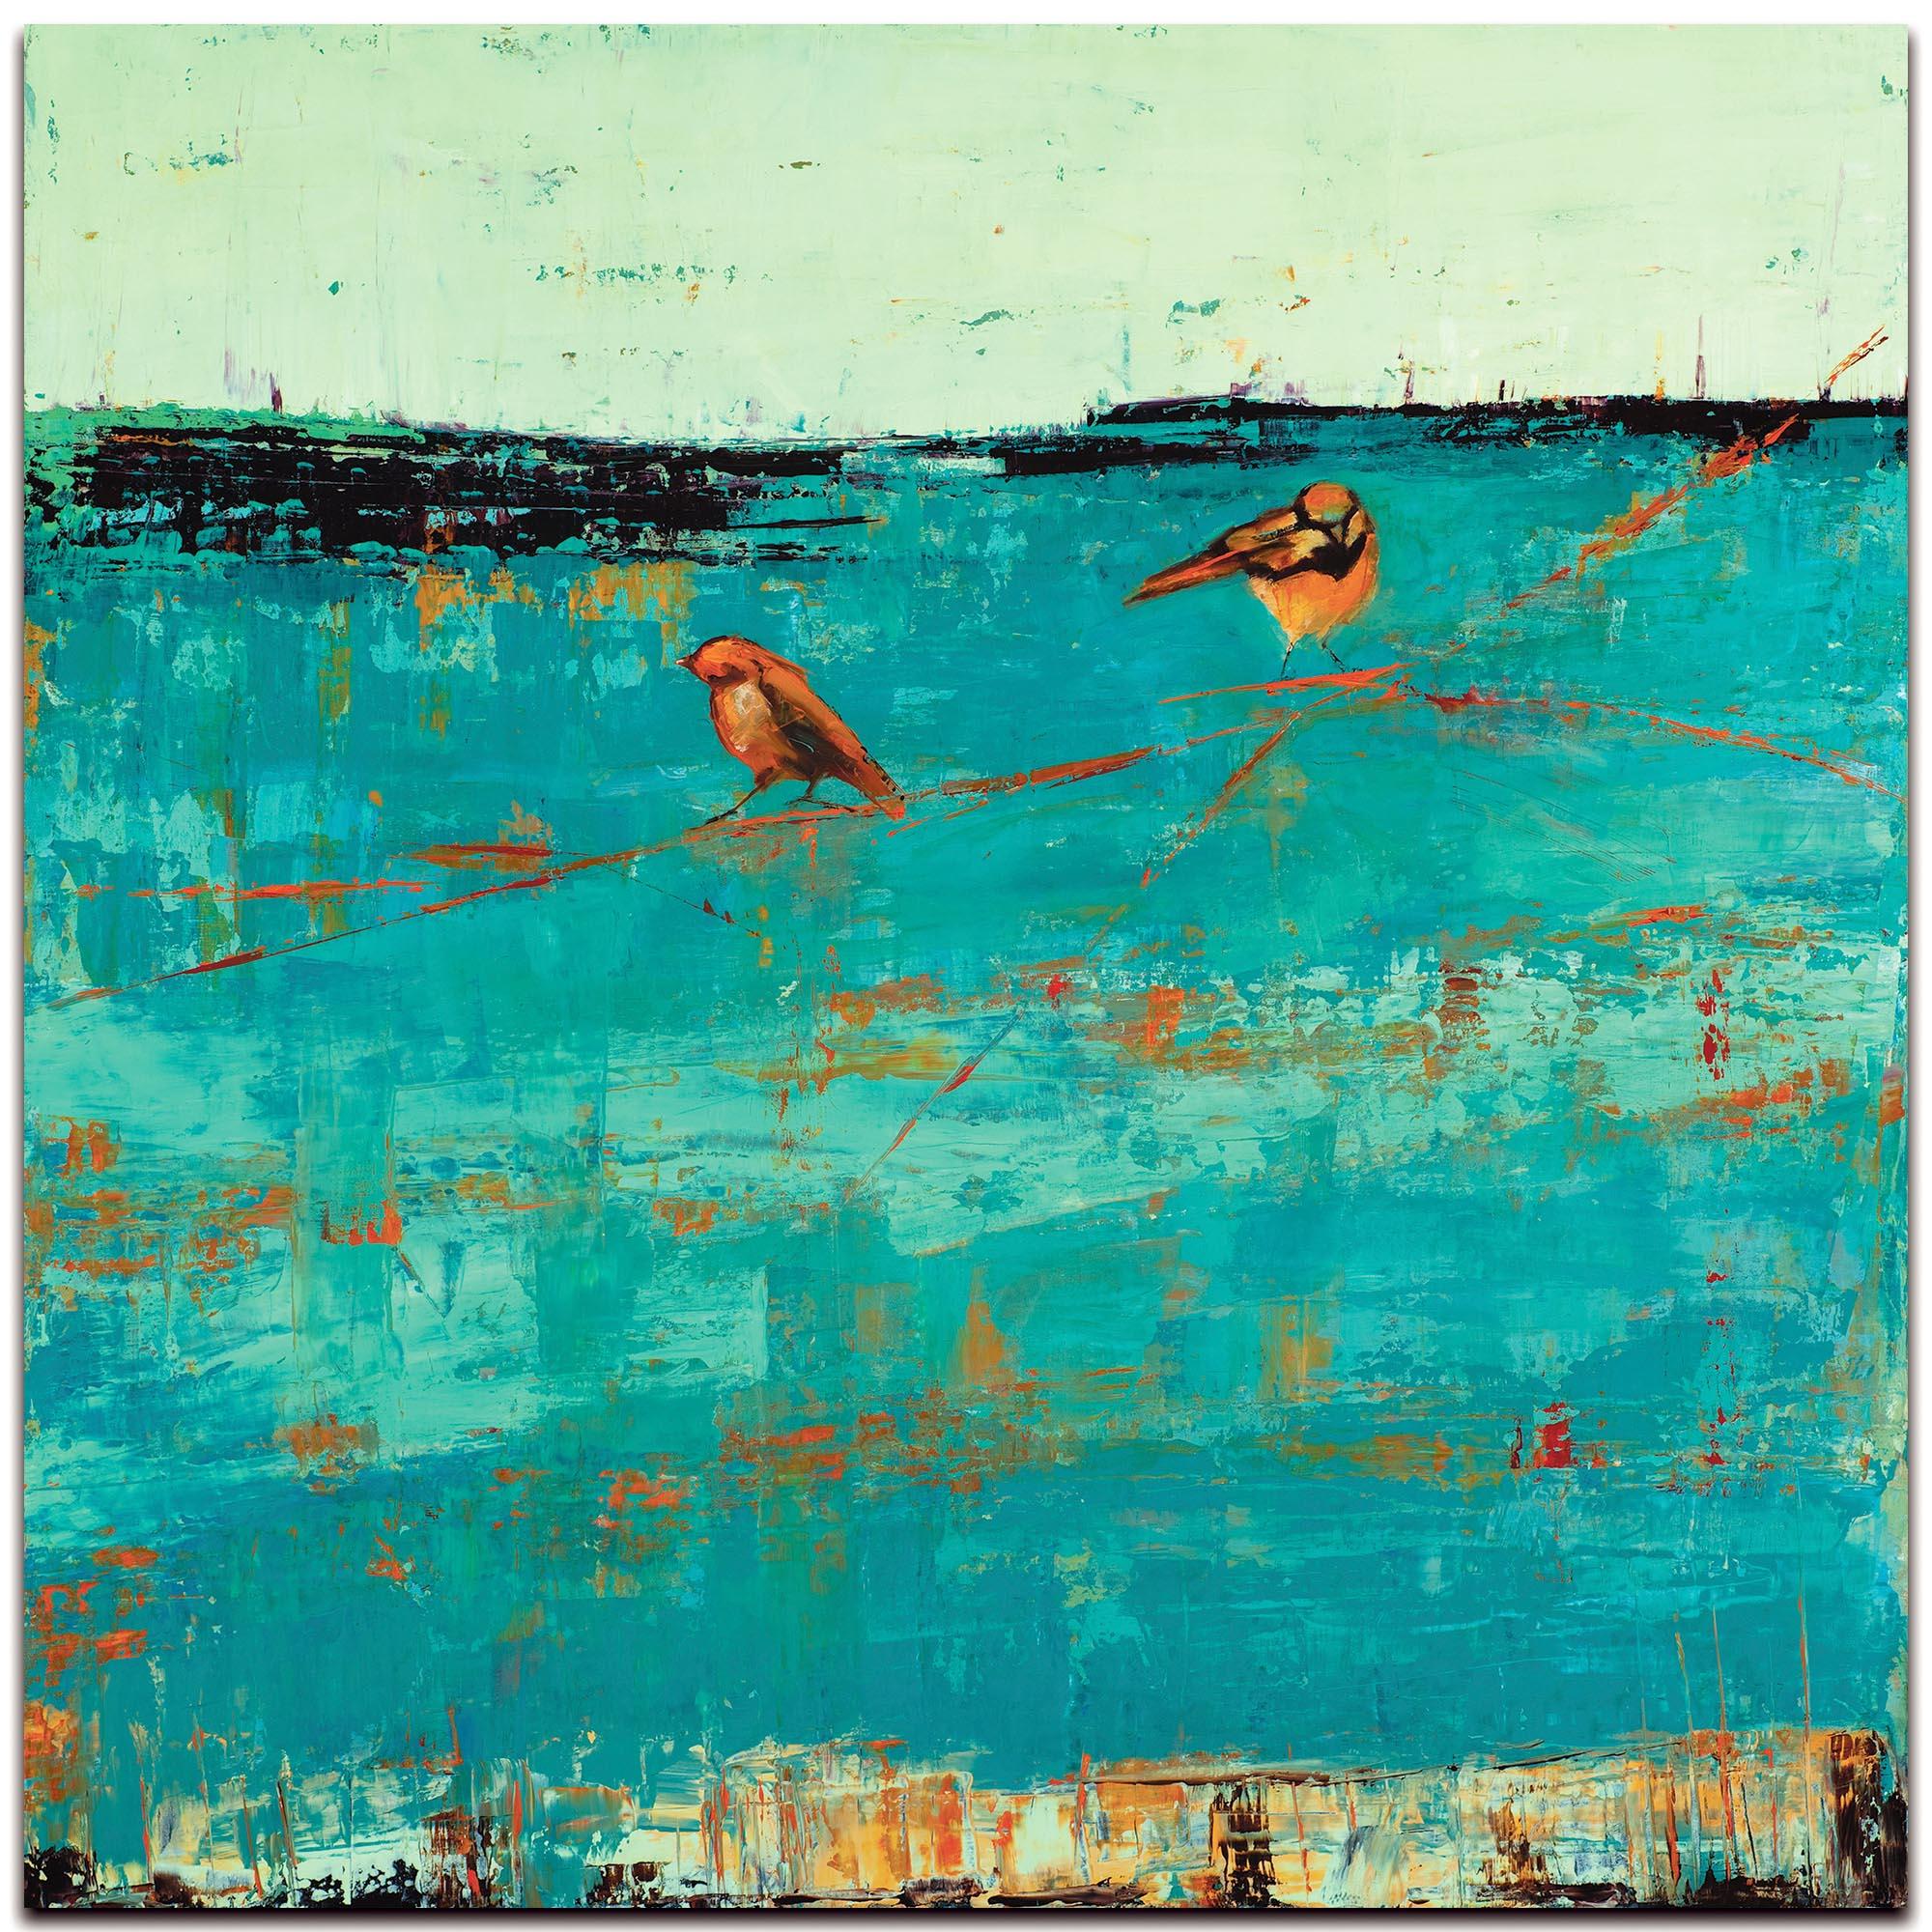 Contemporary Wall Art 'Two Chickadees on a Blue Horizon' - Urban Birds Decor on Metal or Plexiglass